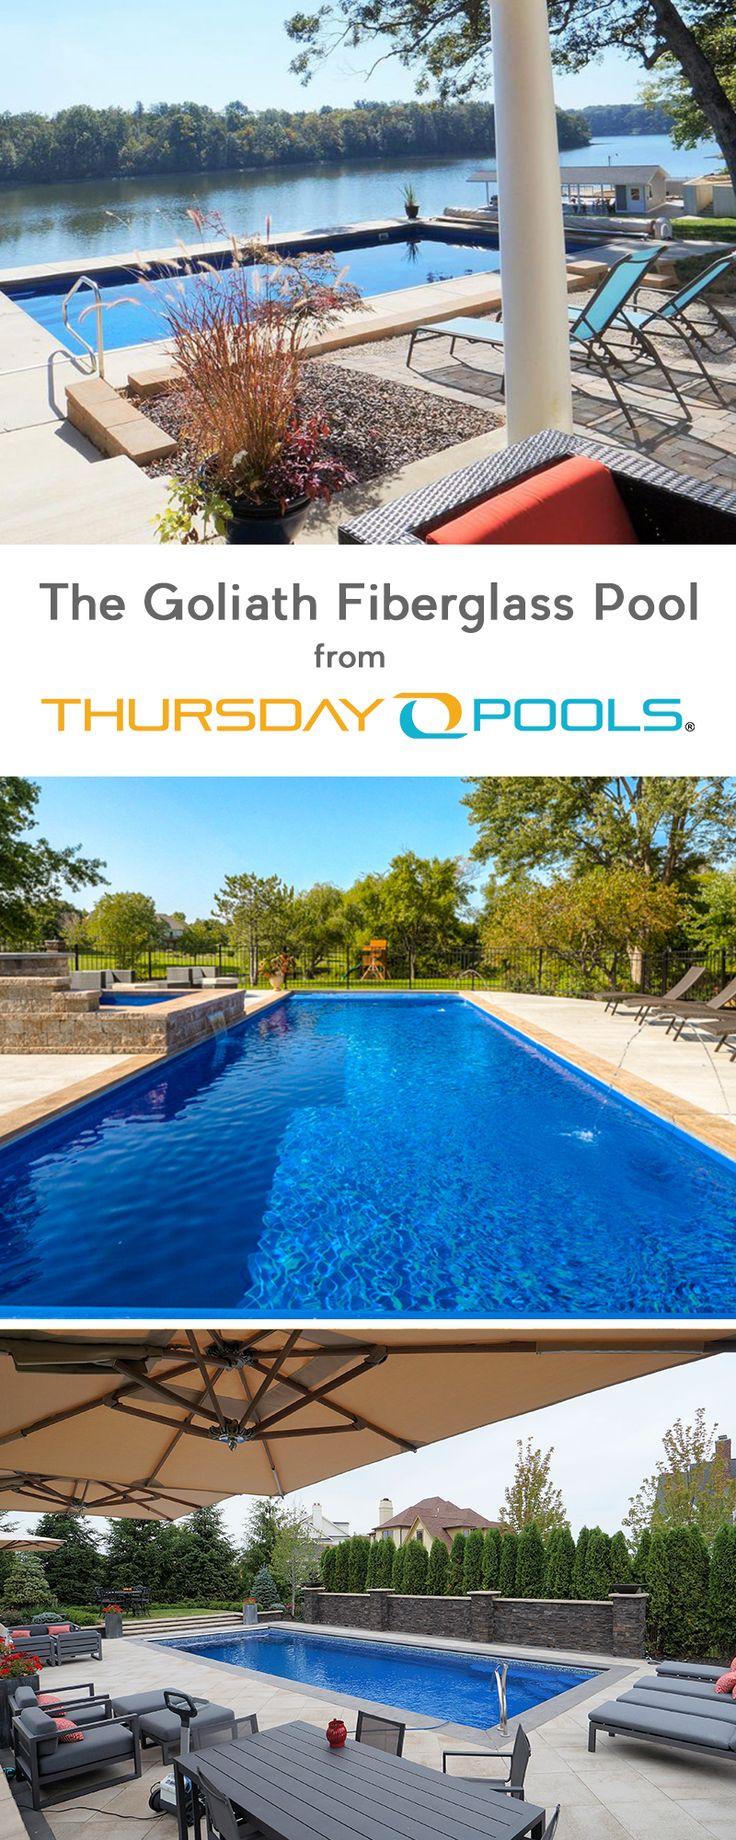 Jacksonville fl in addition fiberglass pools jacksonville fl on home - Checkout The Goliath Fiberglass Pool From Thursday Pools